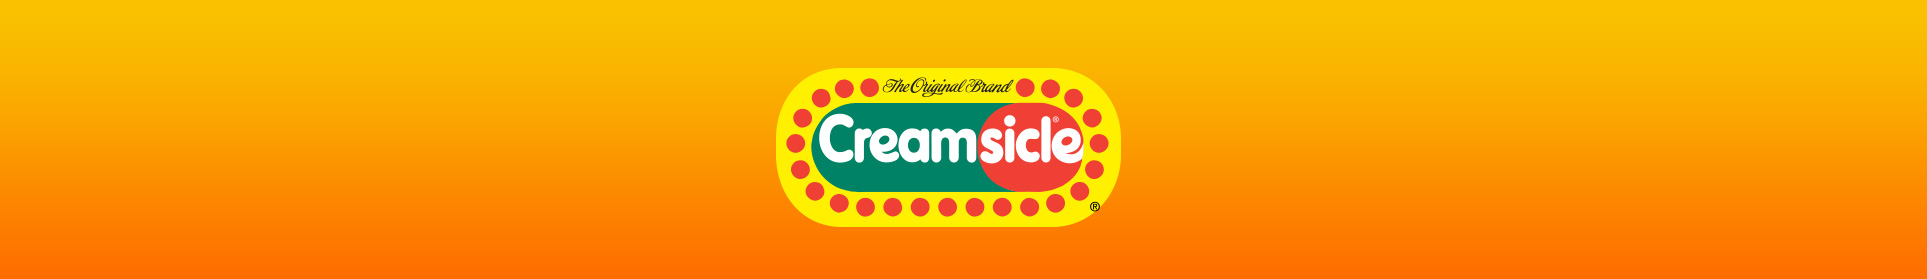 Creamsicle® Cream Bars